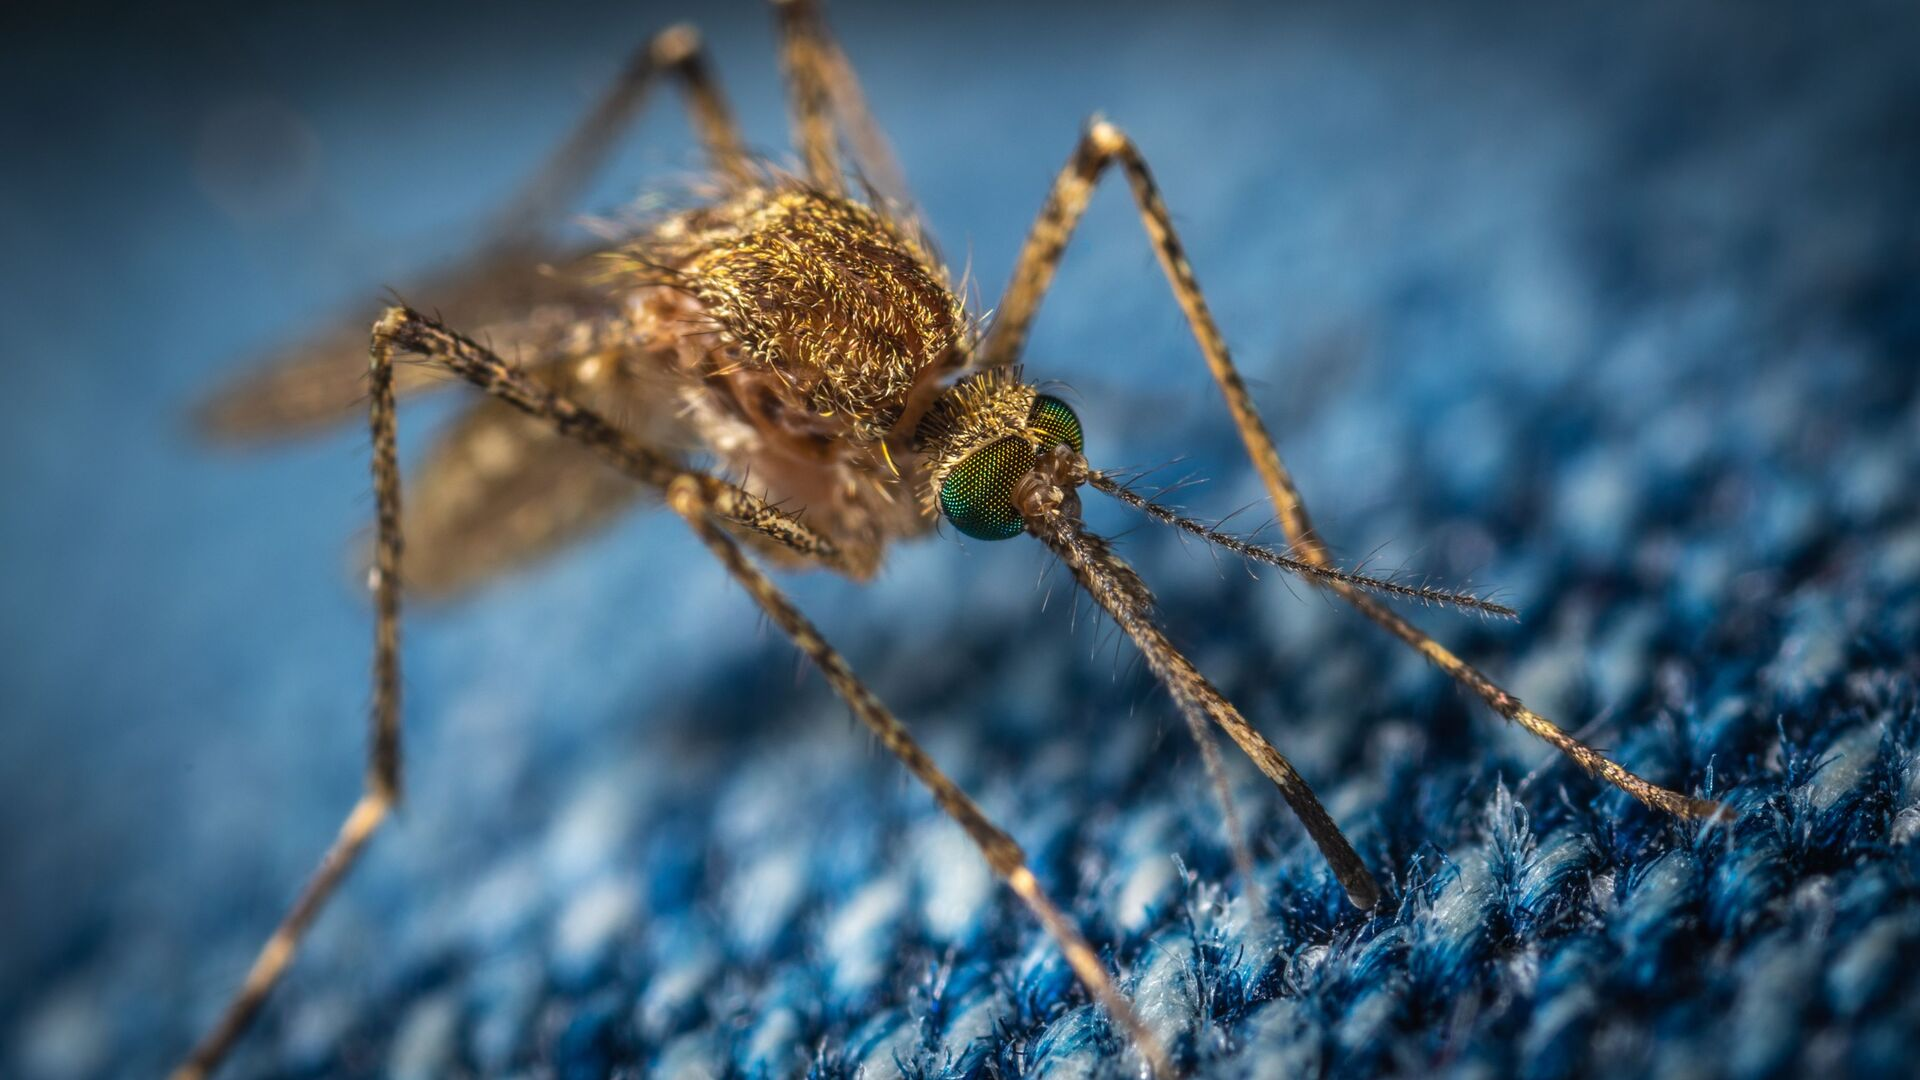 Un mosquito, referencial - Sputnik Mundo, 1920, 18.07.2021